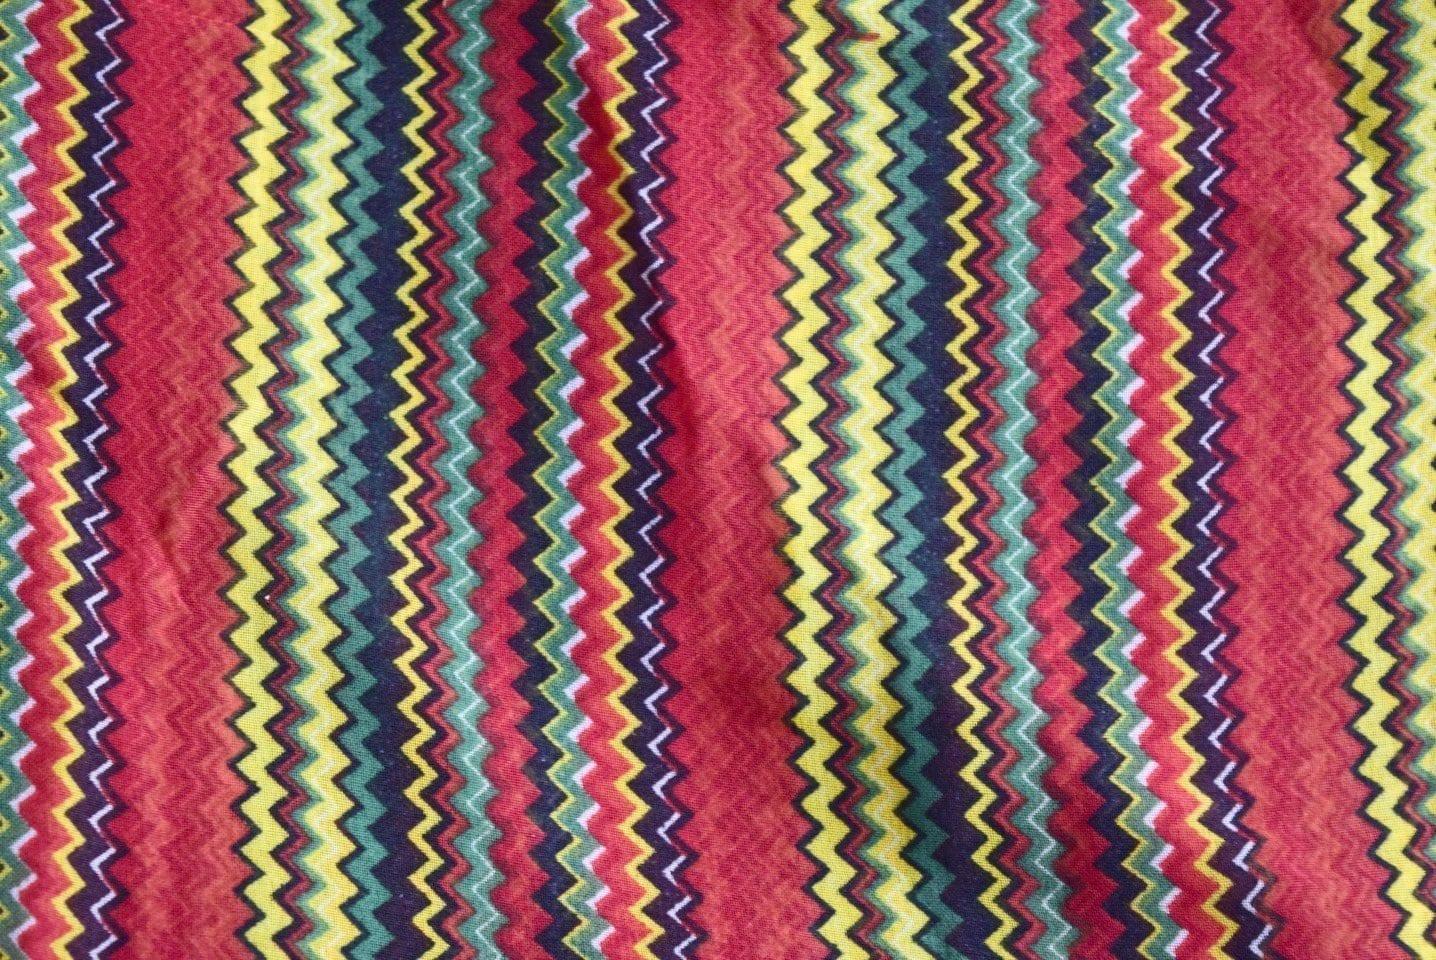 GEORGETTE PRINTED fabric for Kurti, Saree, Salwar, Dupatta GF029 1